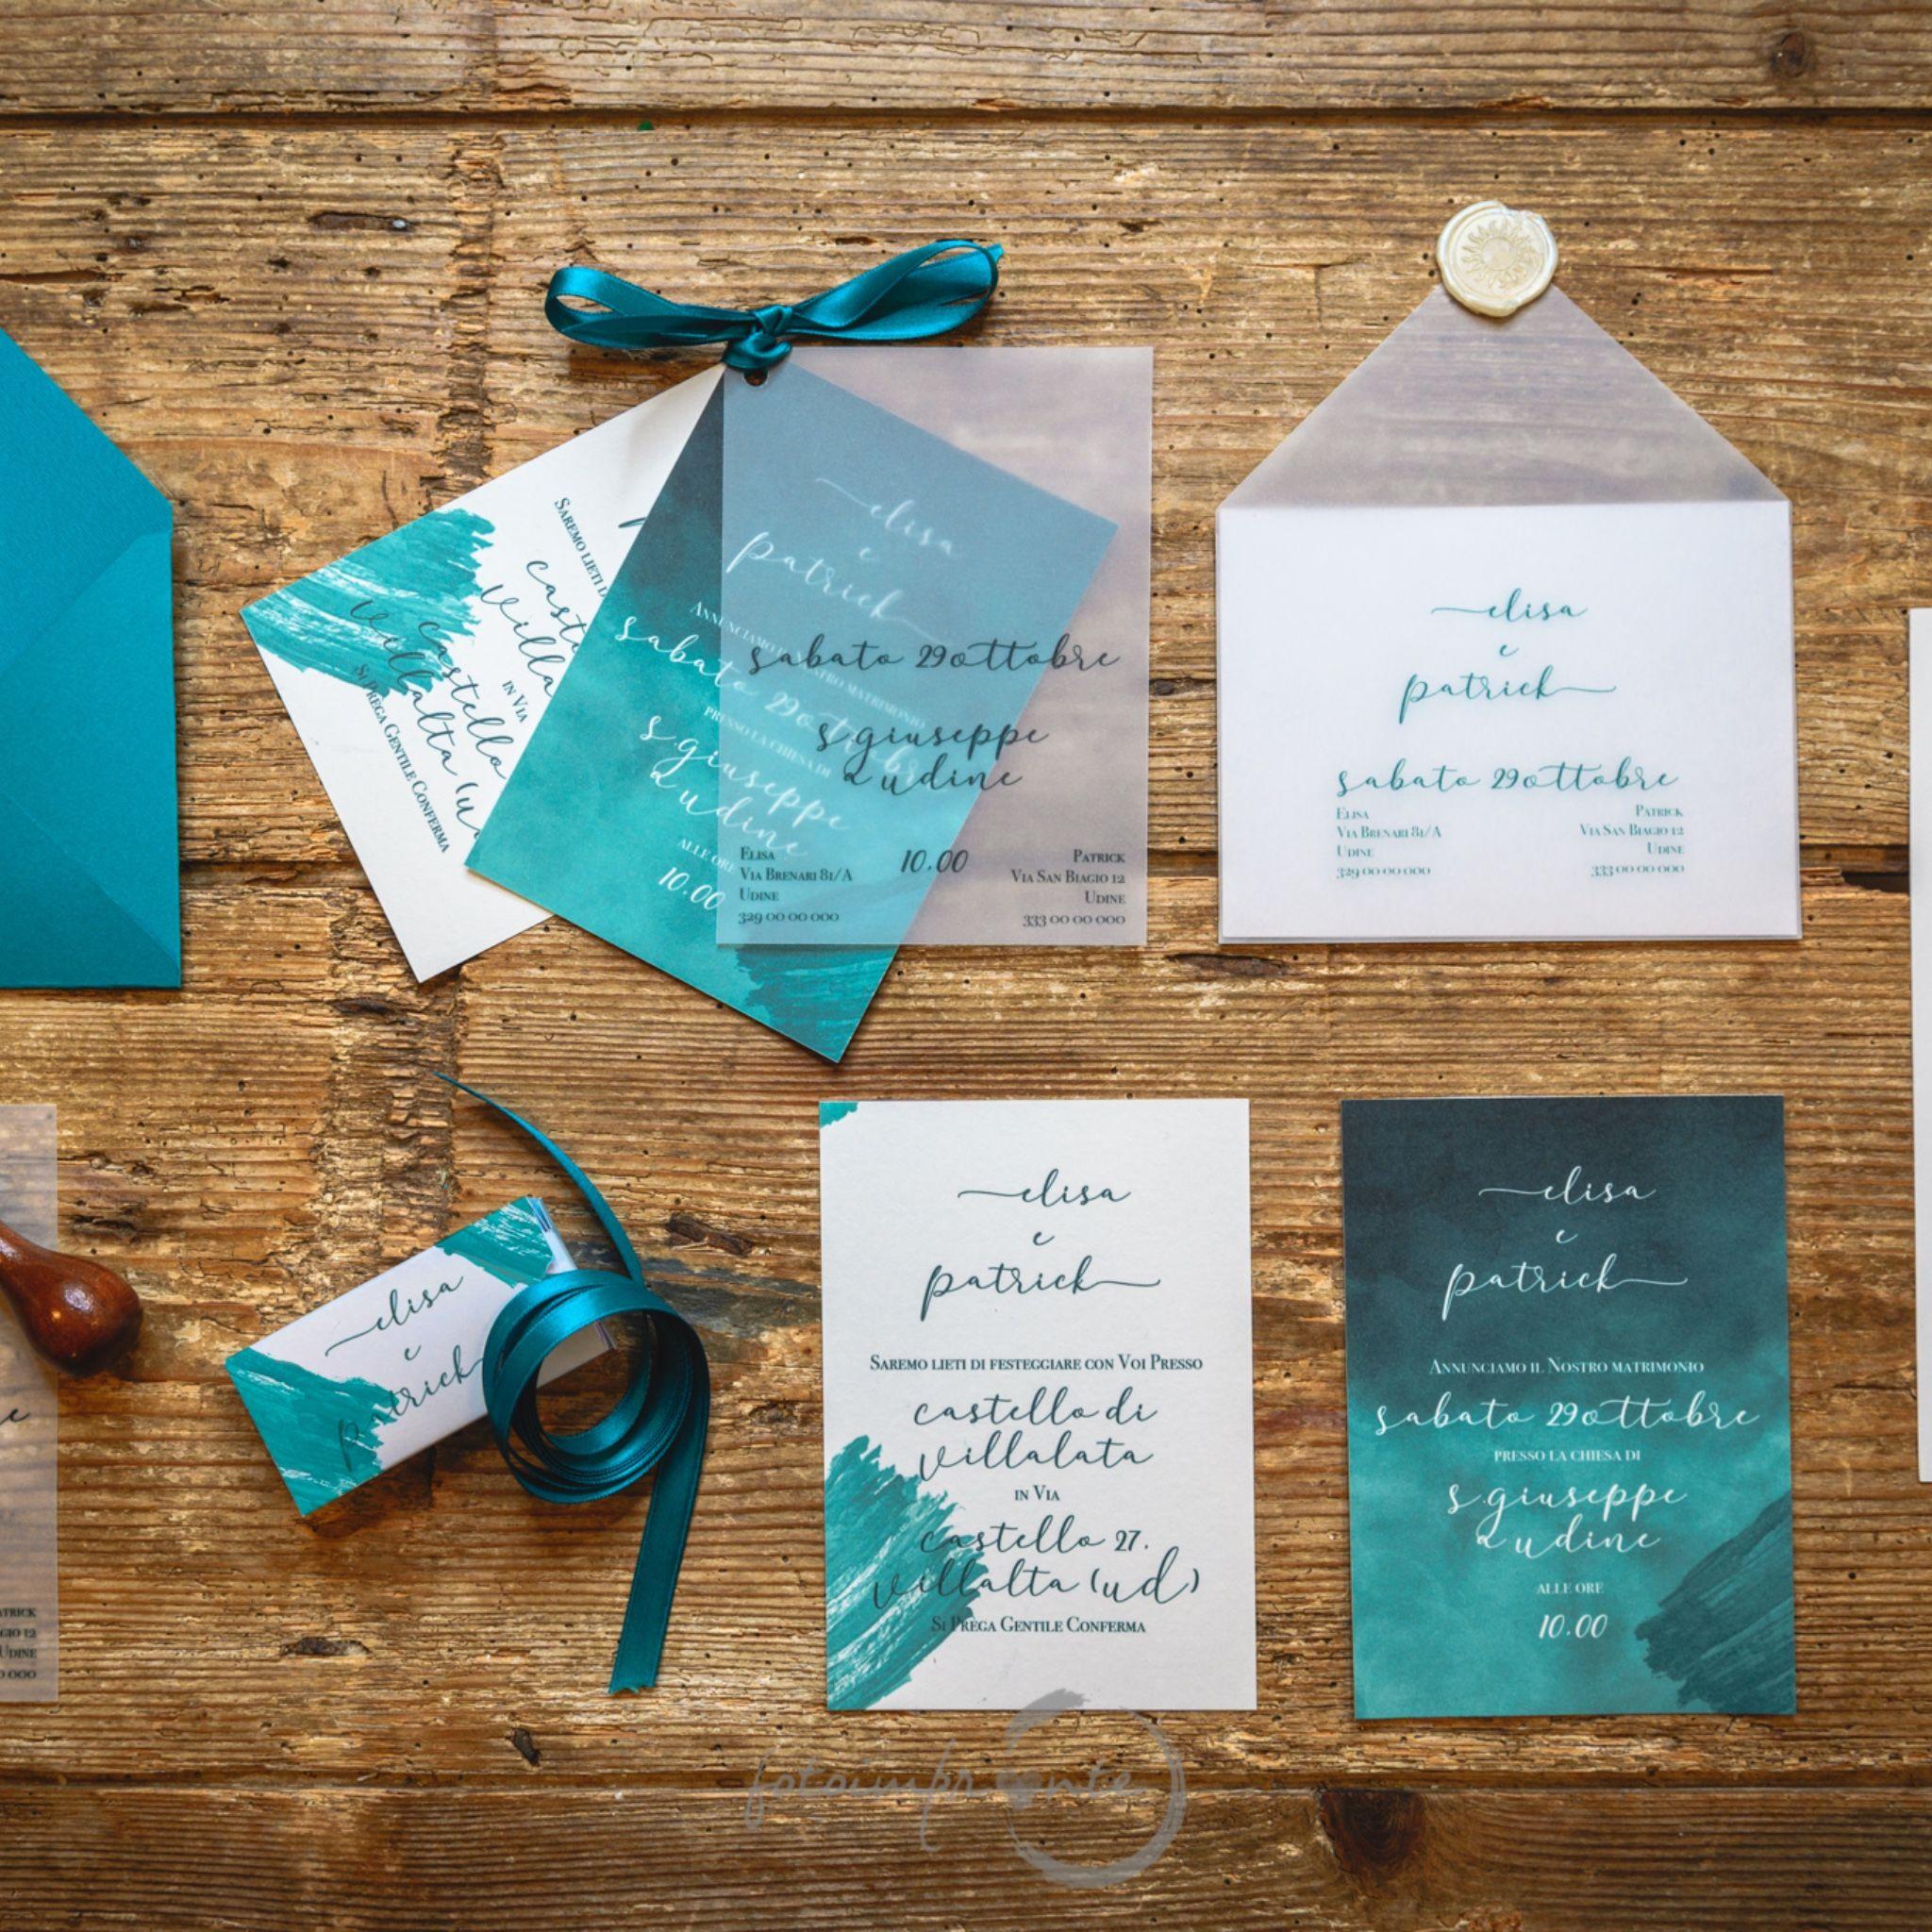 Partecipazioni Matrimonio Udine.Carta Cotone Battuta Carta Satin Traslucida E Tanta Fantasia